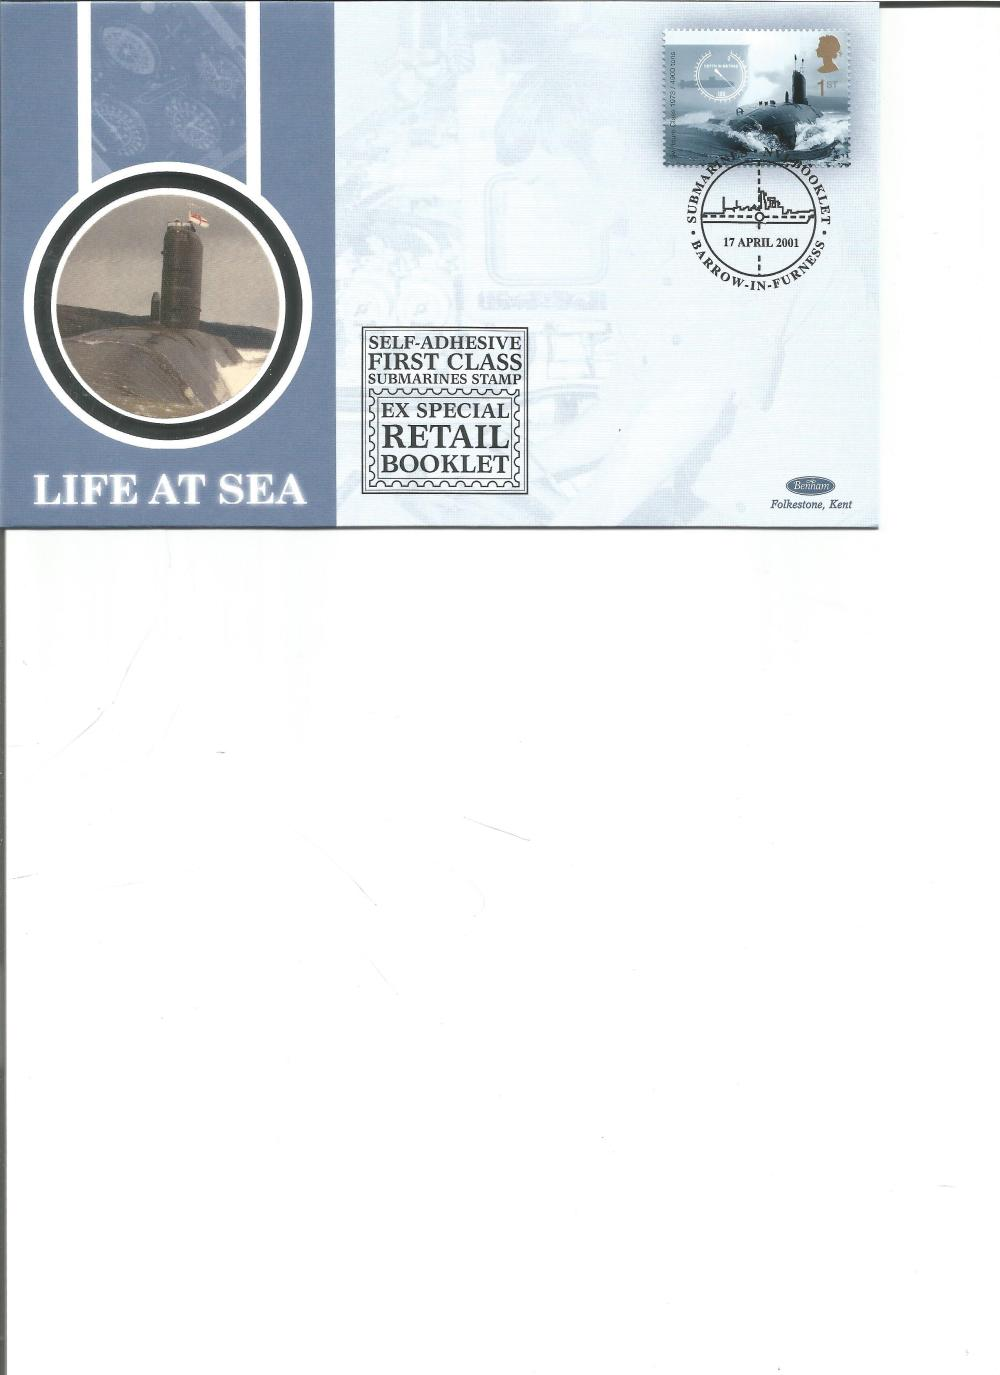 FDC Benham Silk Life at Sea Submarines Retail Booklet BSSP57 PM 17th April 2001. We combine